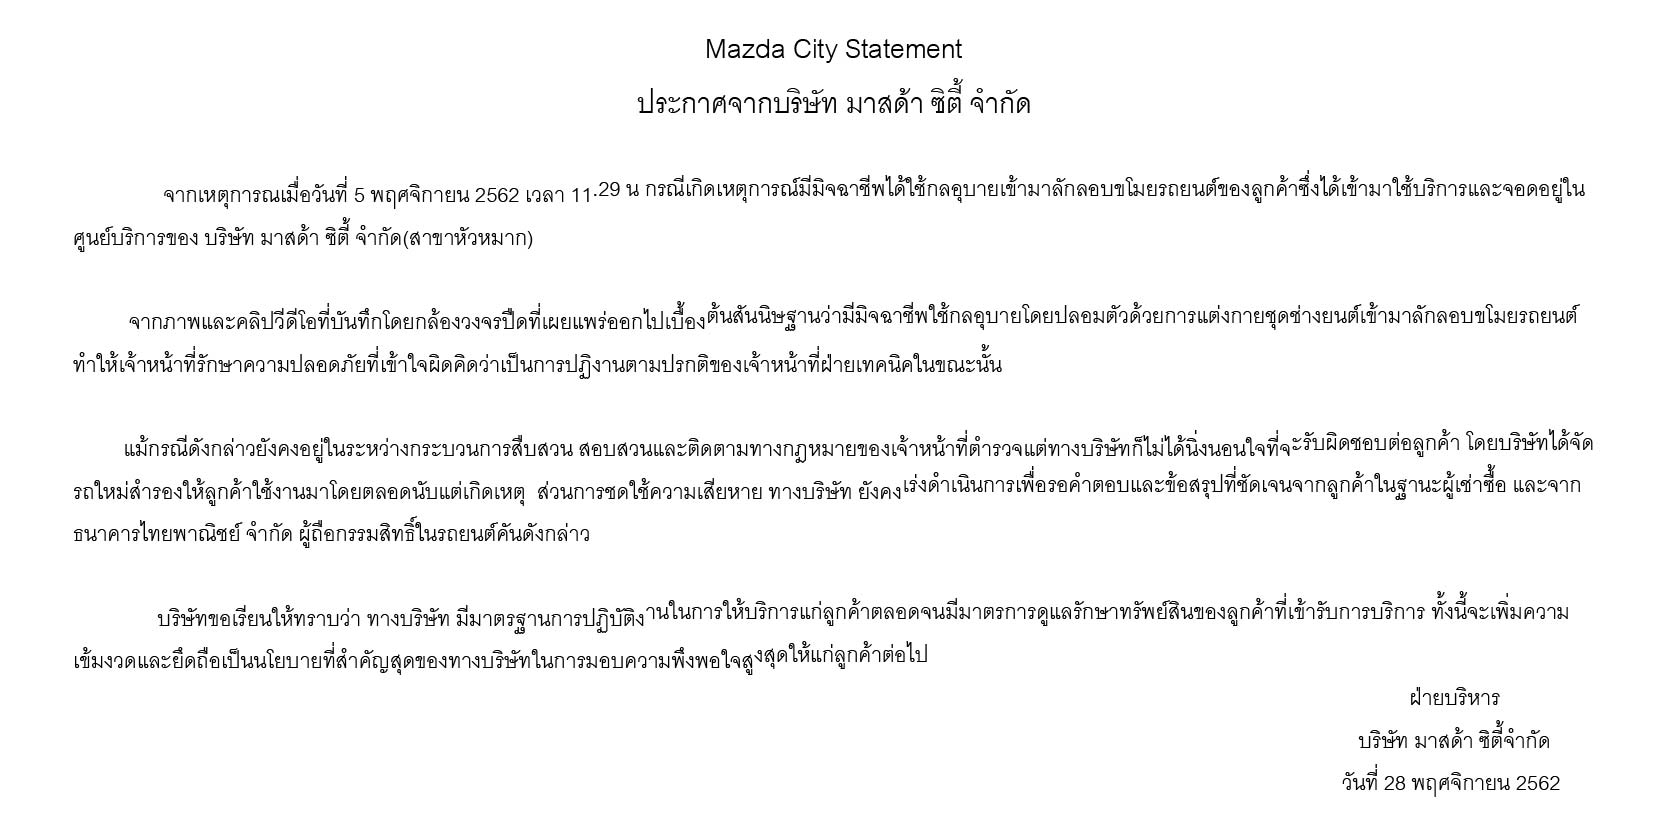 Mazda City Statement (SILA revised 28 Nov 2019) web-01-01